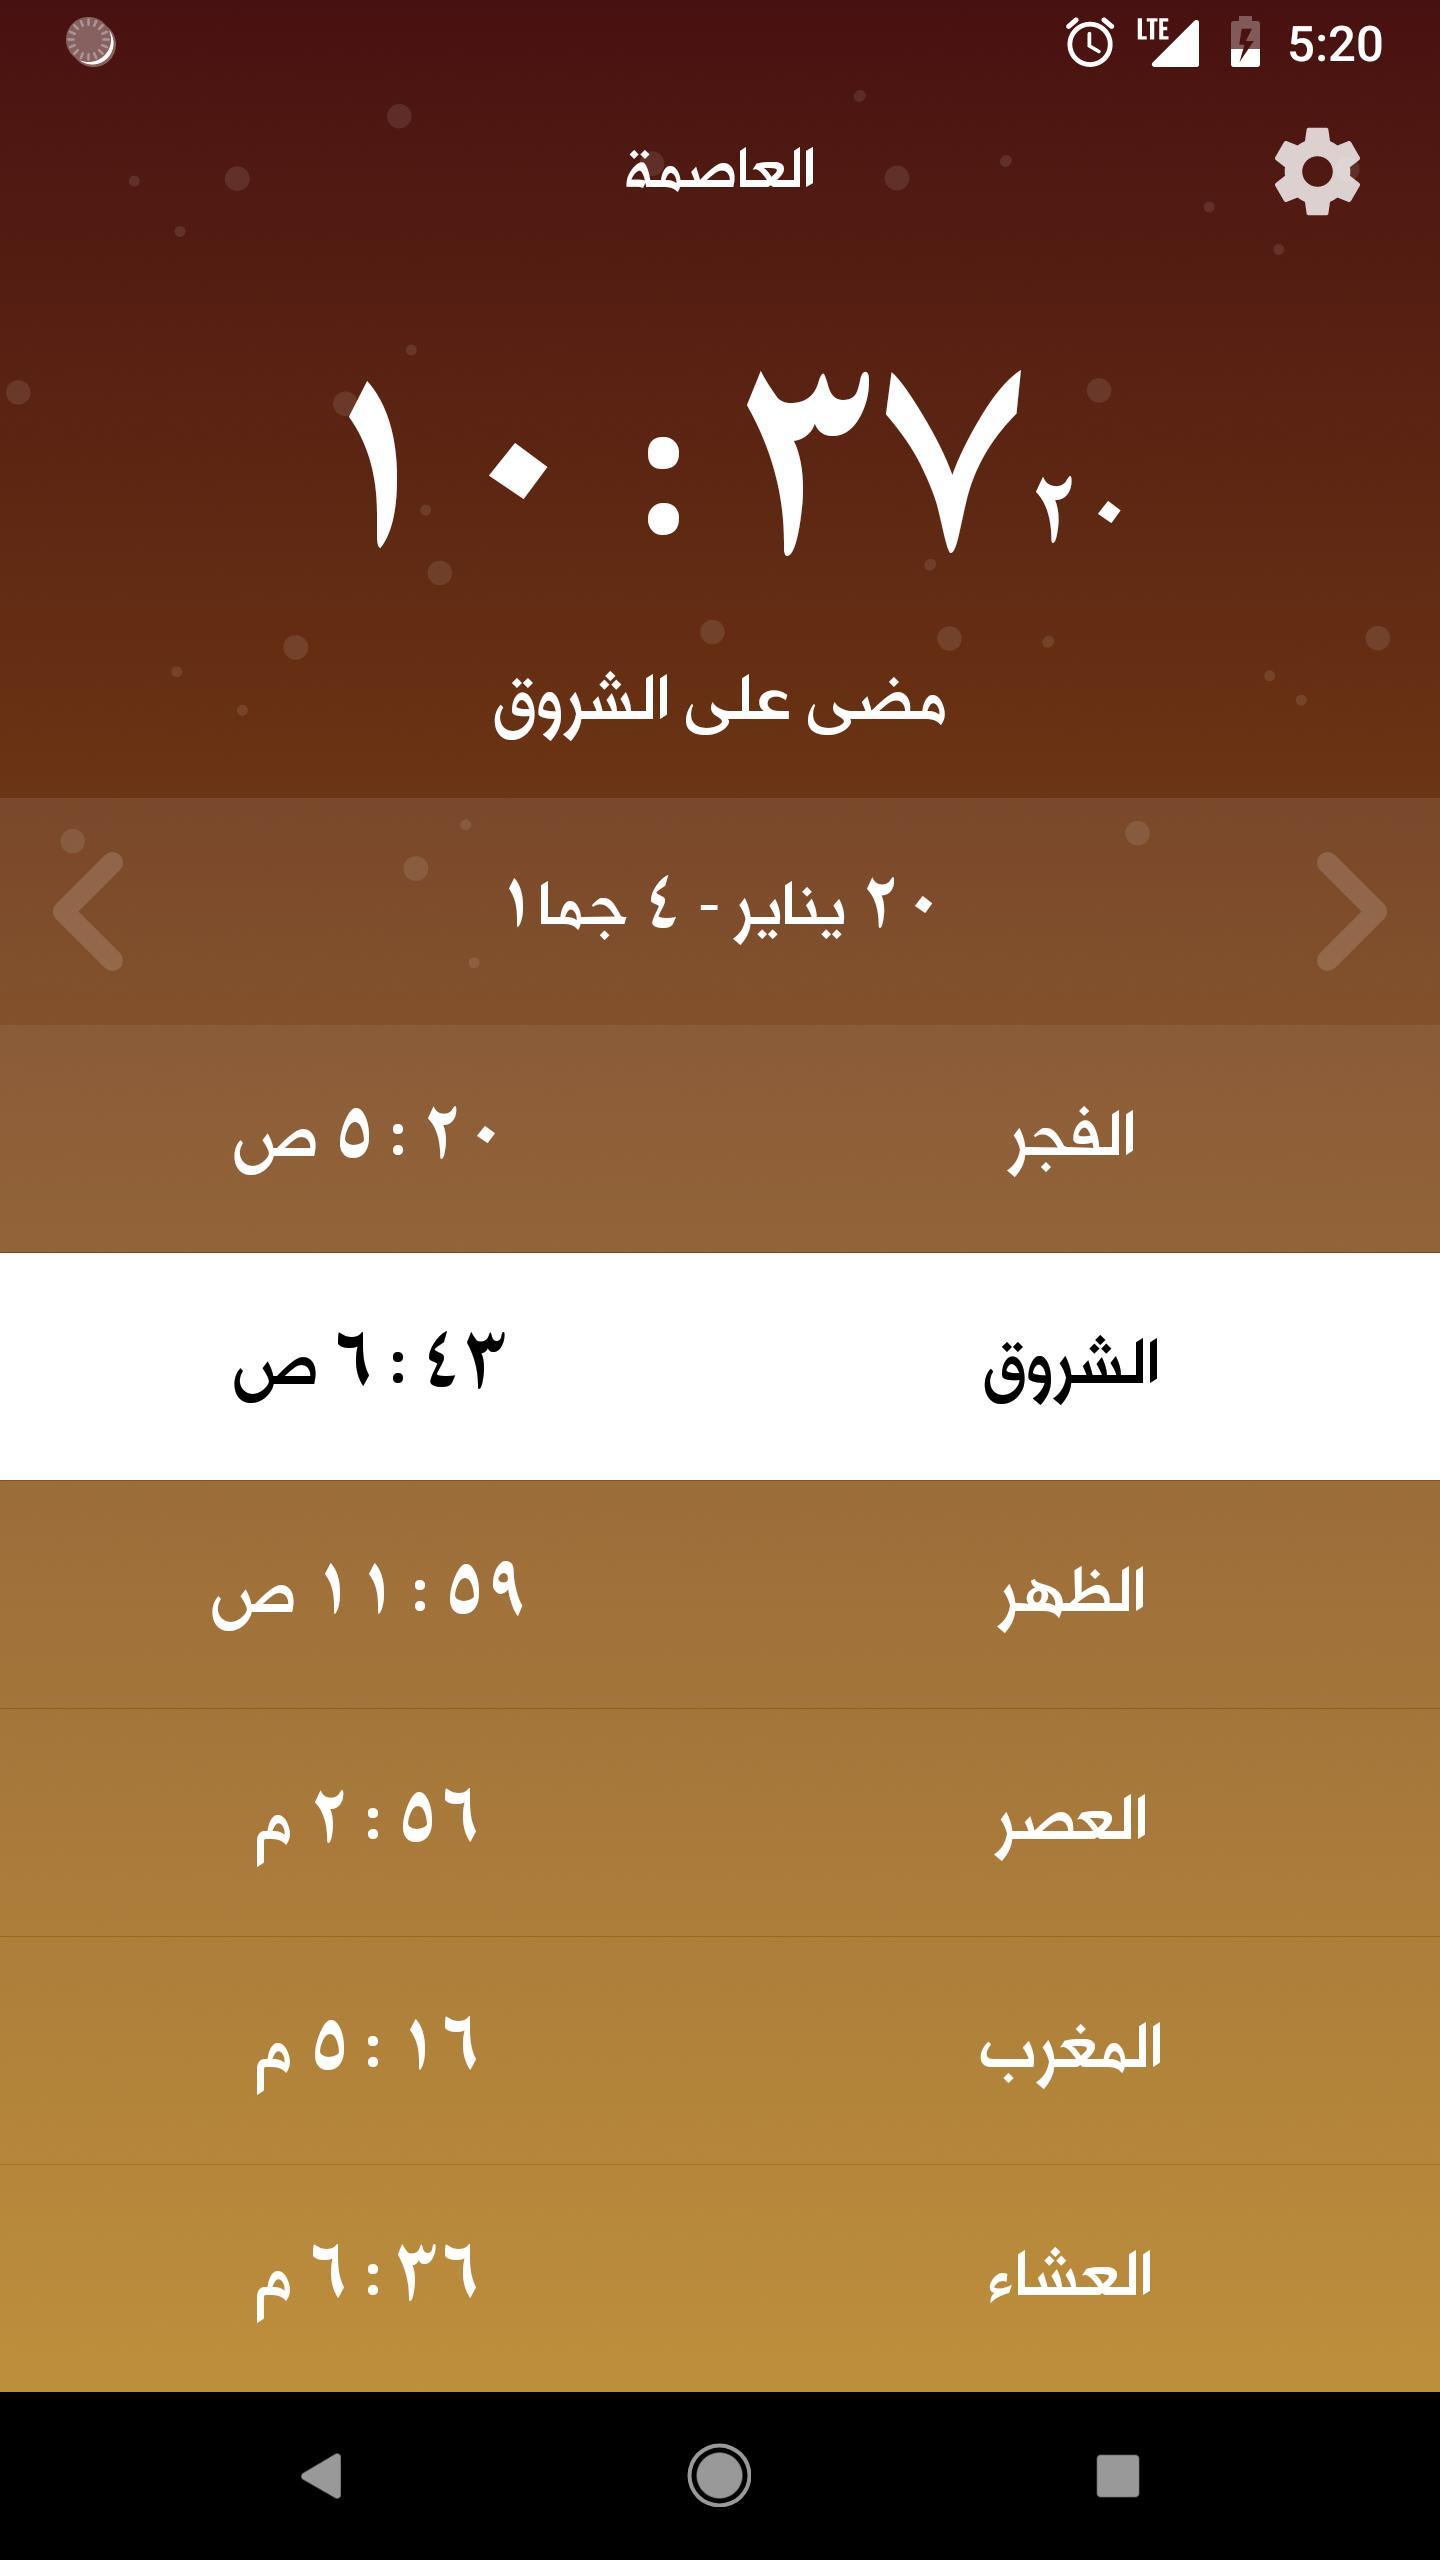 Mohamed Shawqi Mohamedshawqi42 Twitter 9